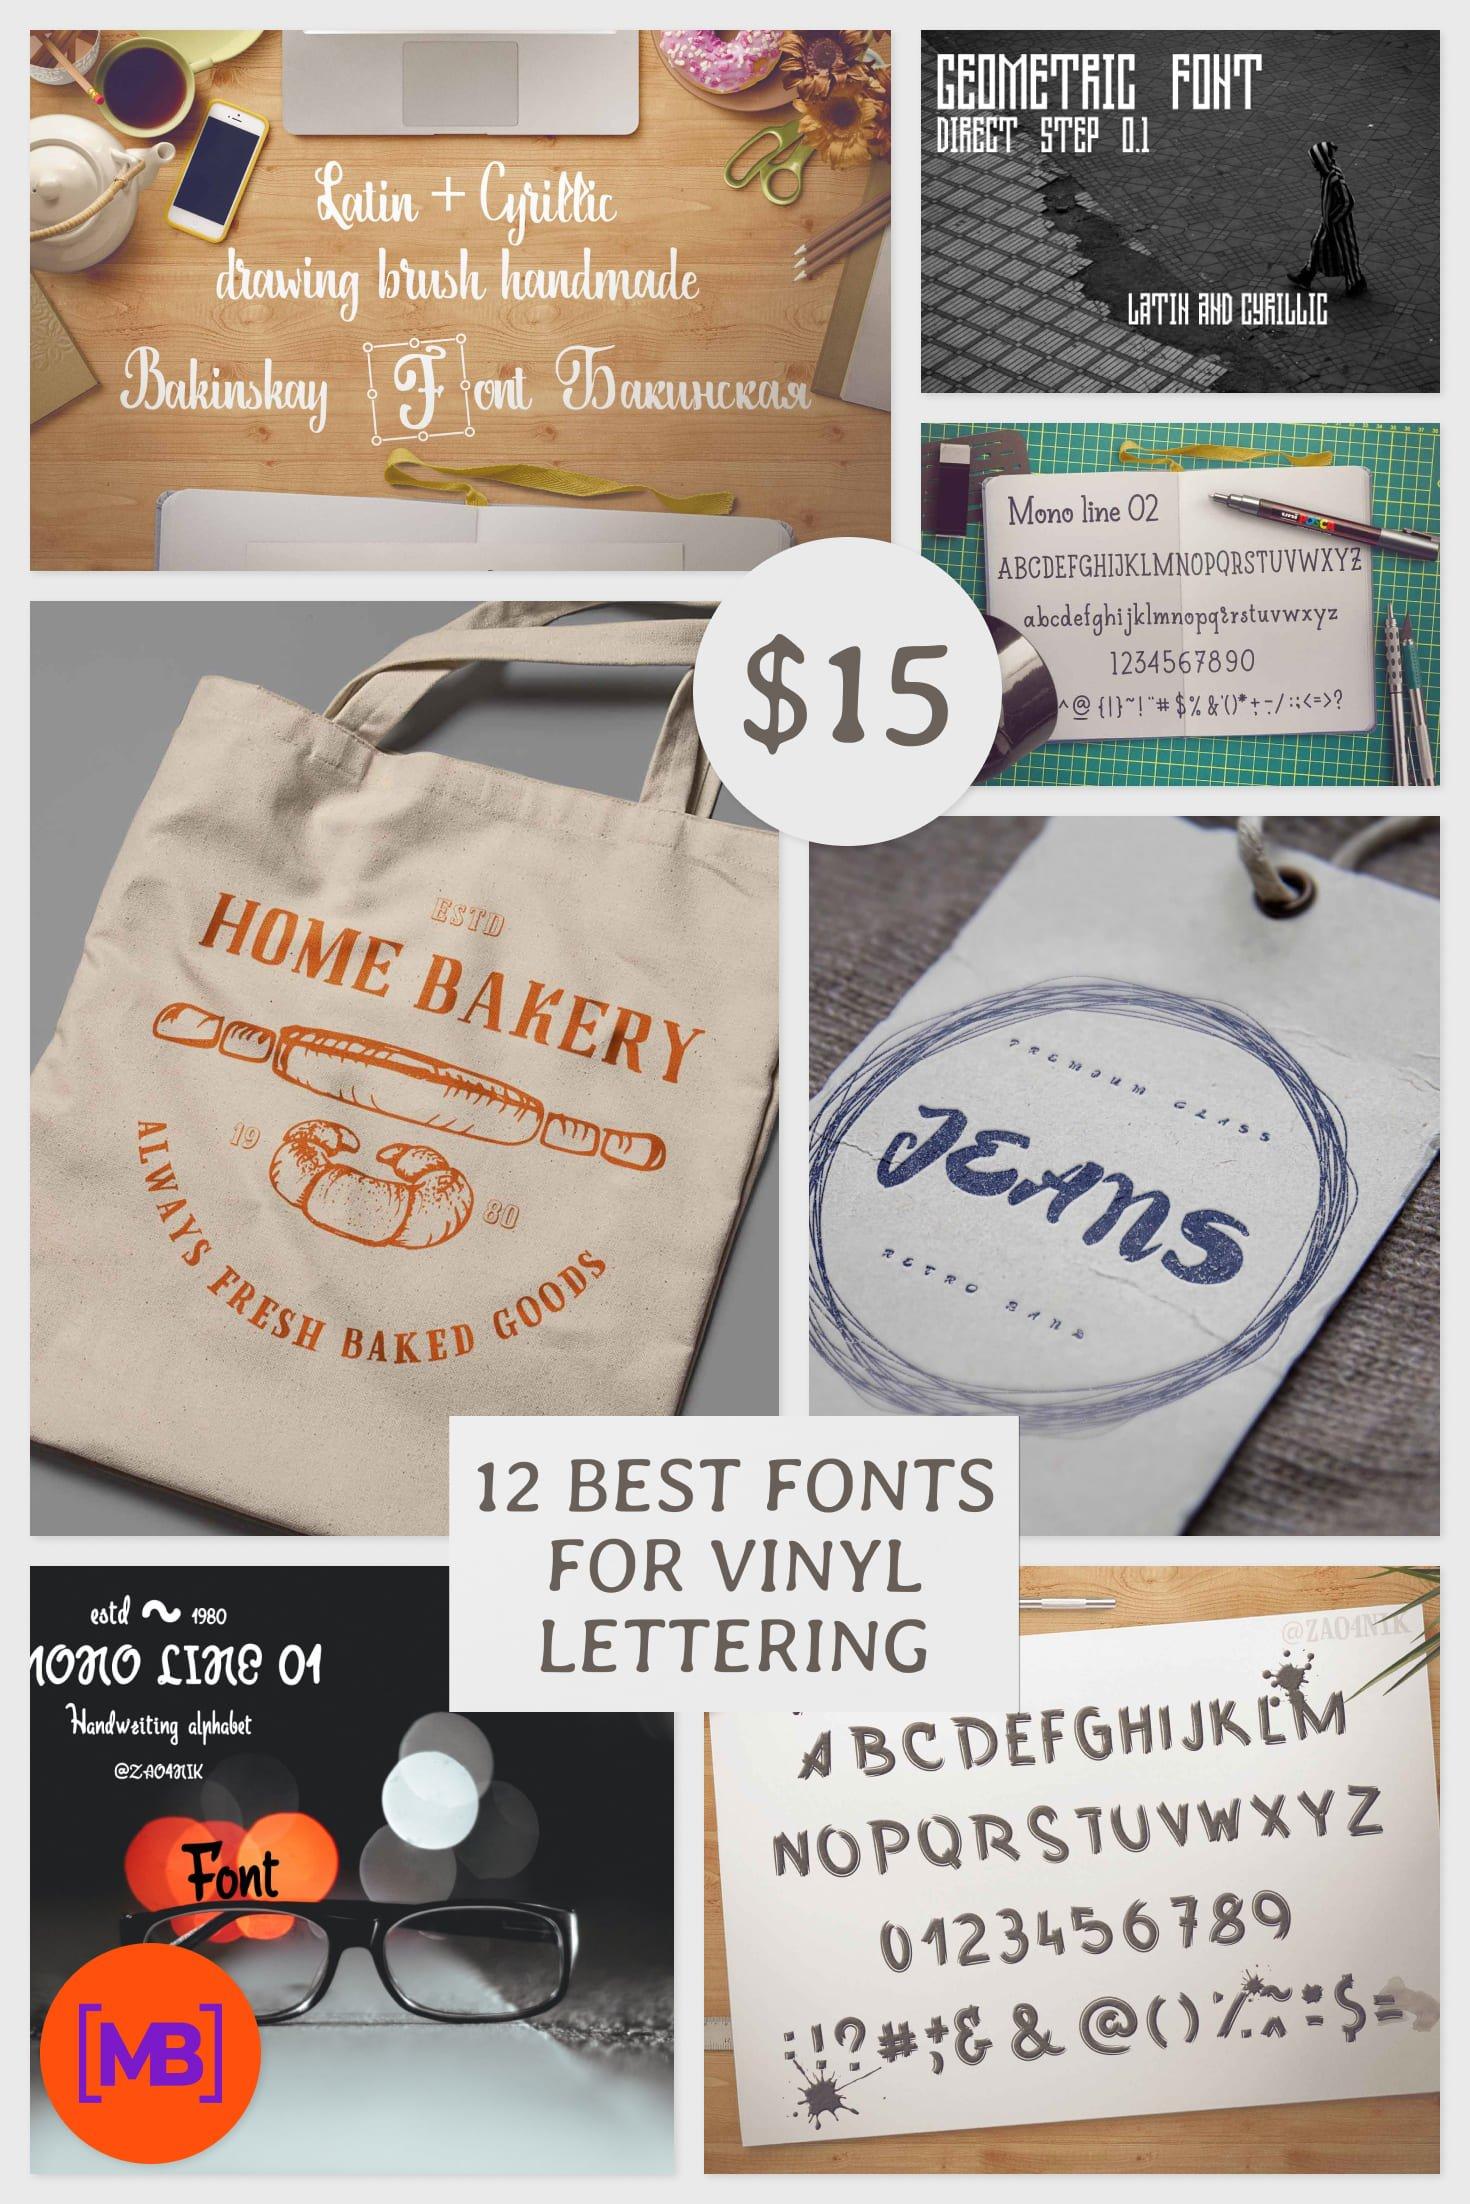 12 Best Fonts for Vinyl Lettering in 2020. Collage Image.